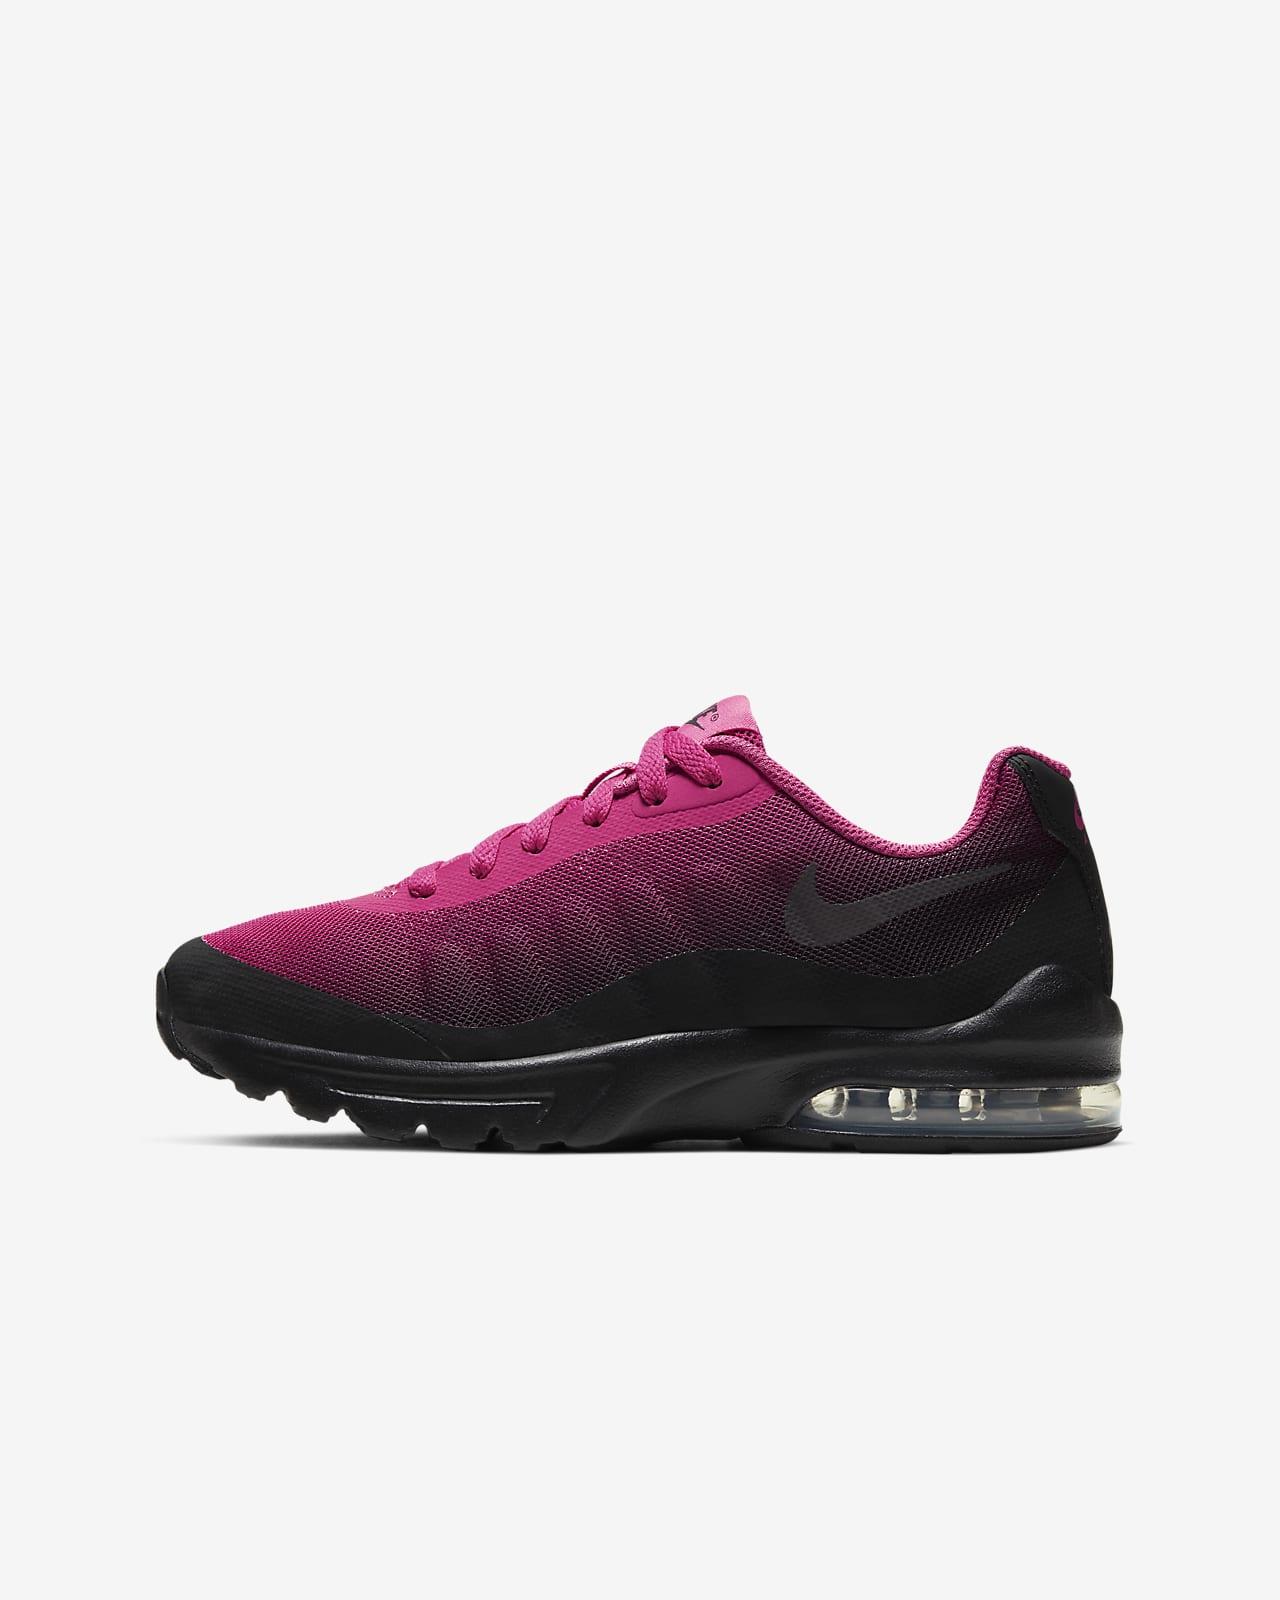 Buty dla dużych dzieci Nike Air Max Invigor